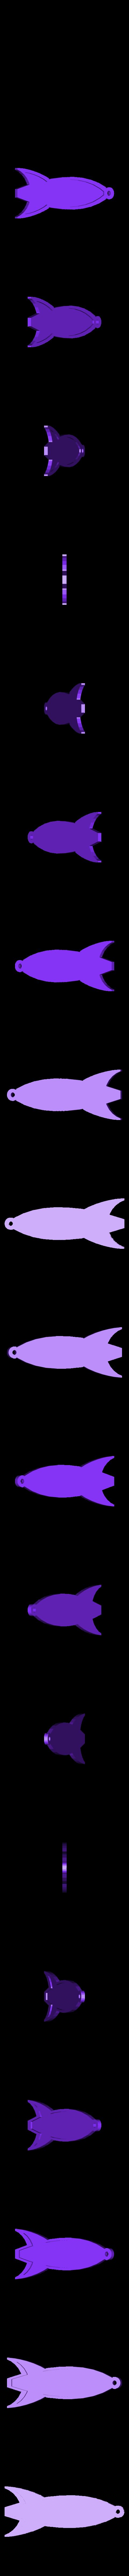 blank_rocket_keychain.stl Download free STL file Customizable Futurama Rocket With Alien Text • 3D printer model, ferjerez3d